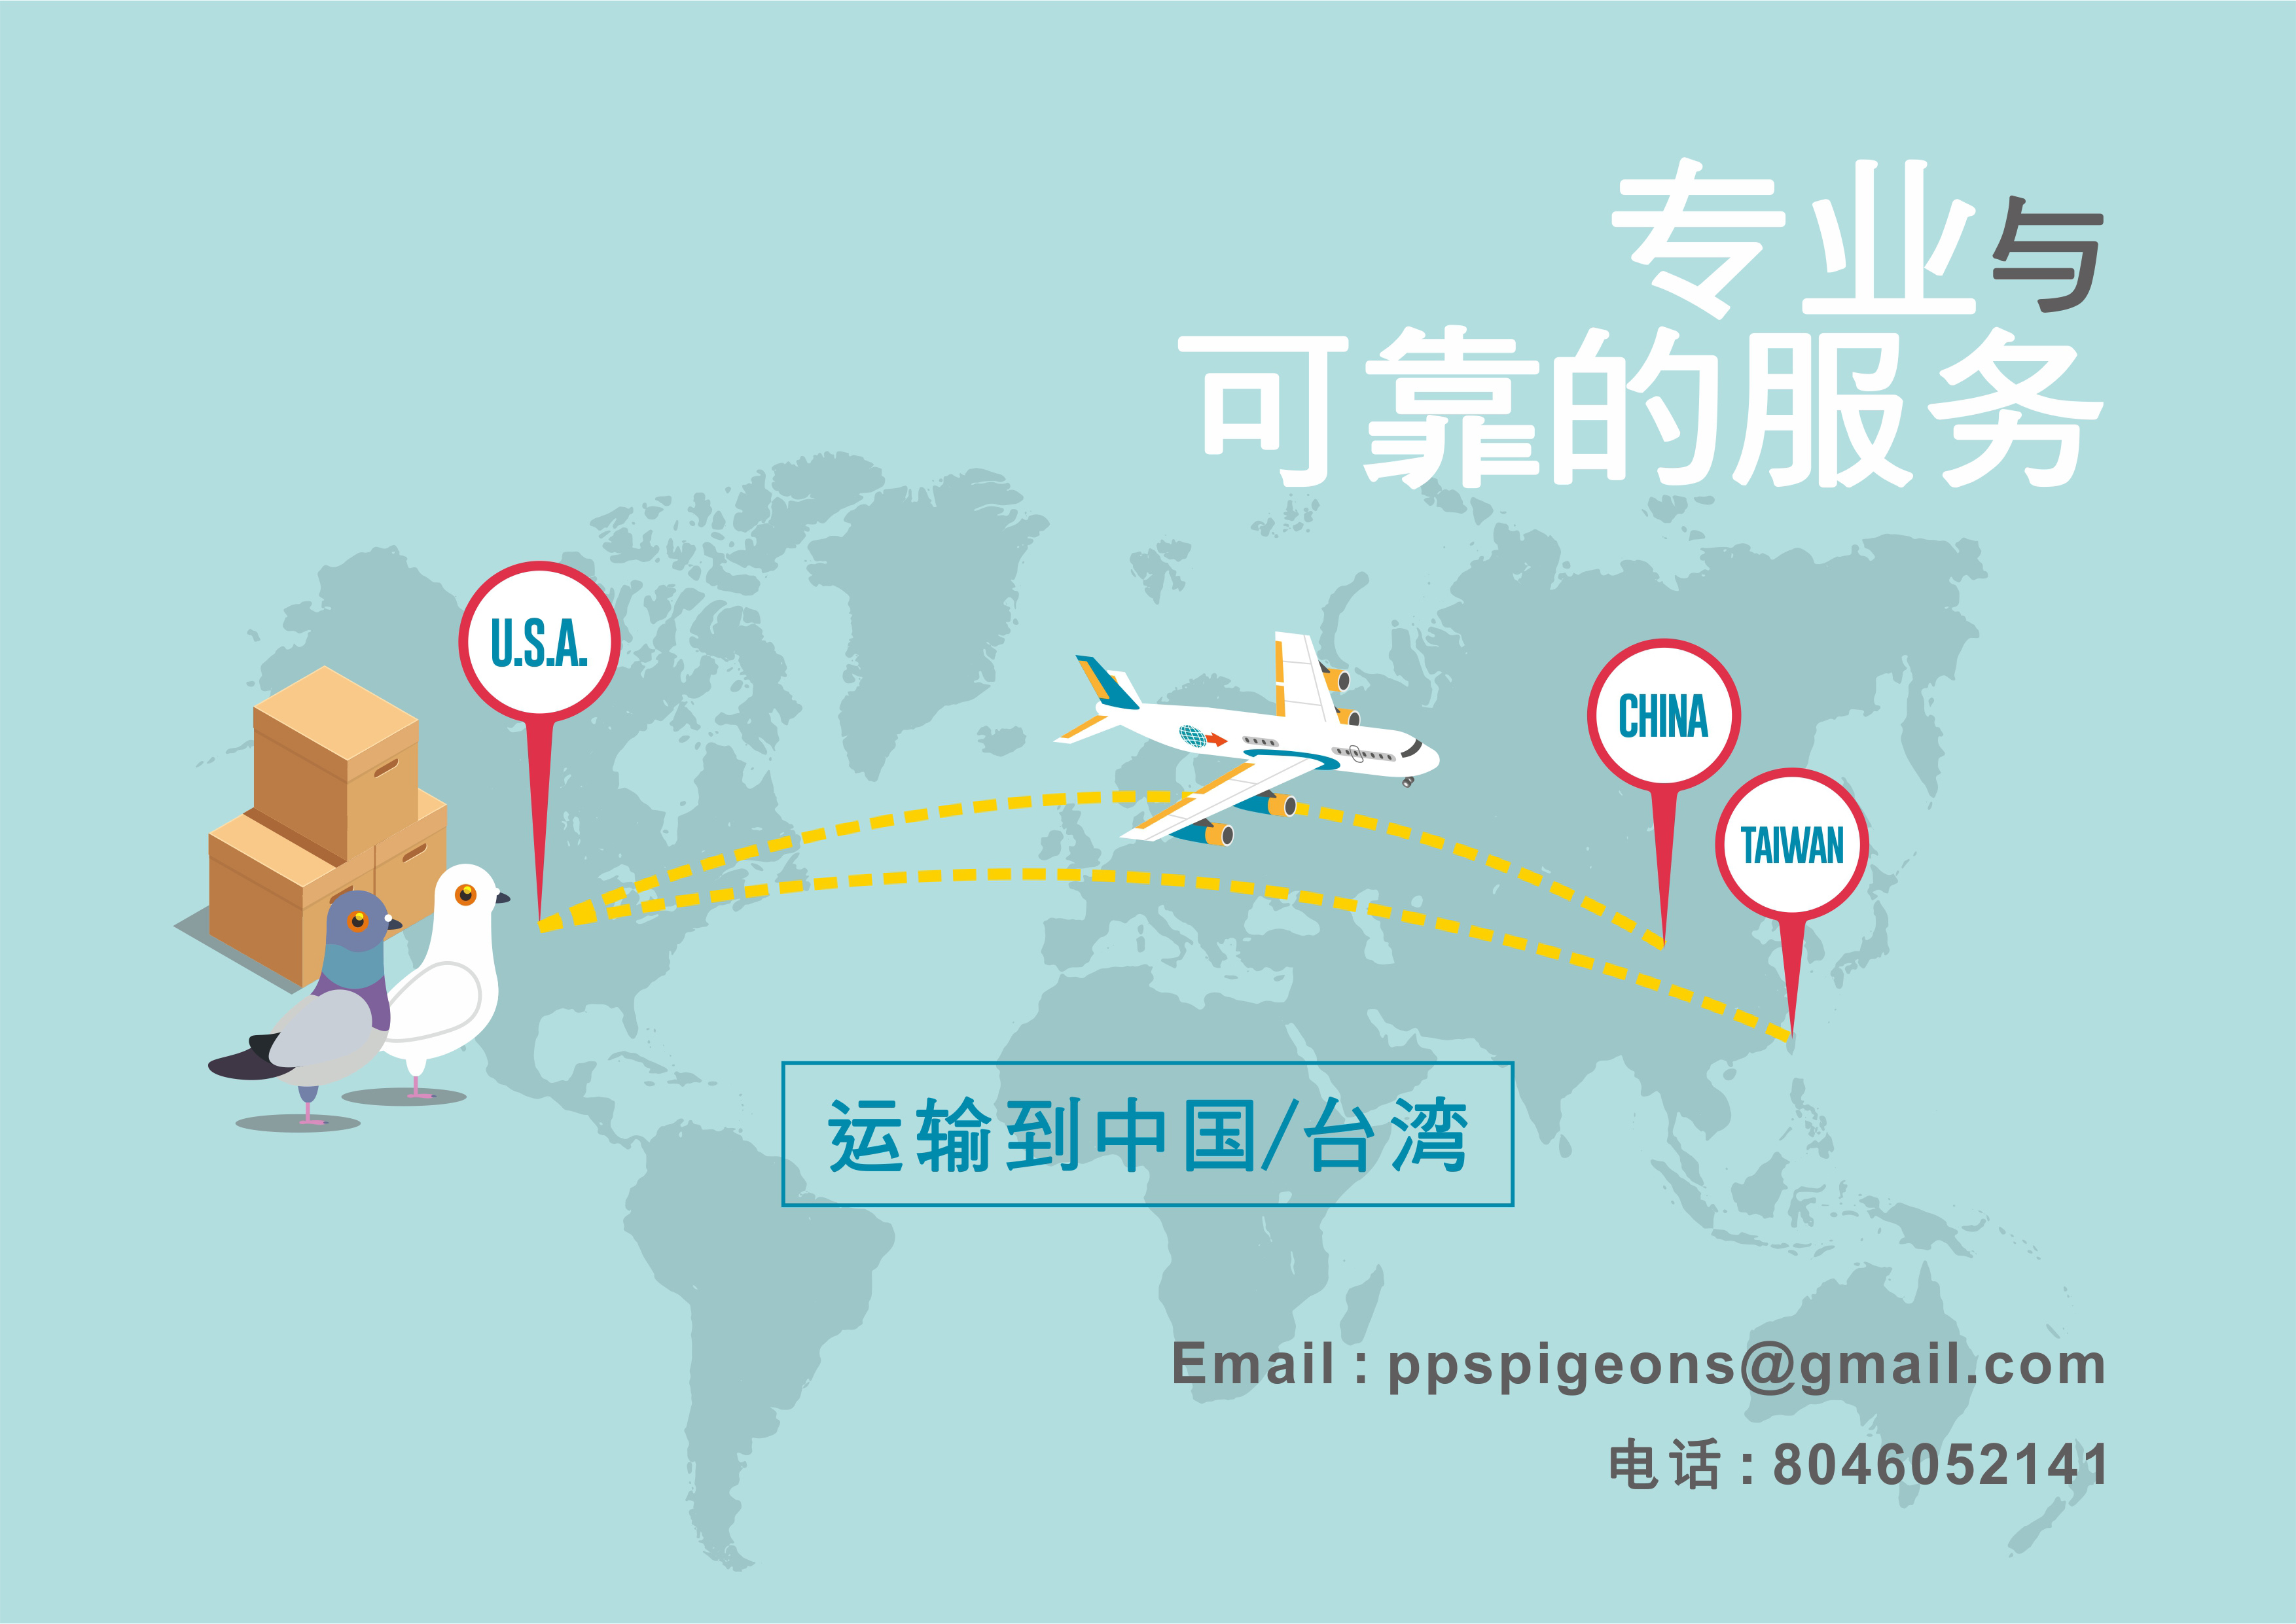 Pigeon Export Service & 信鸽运输服务